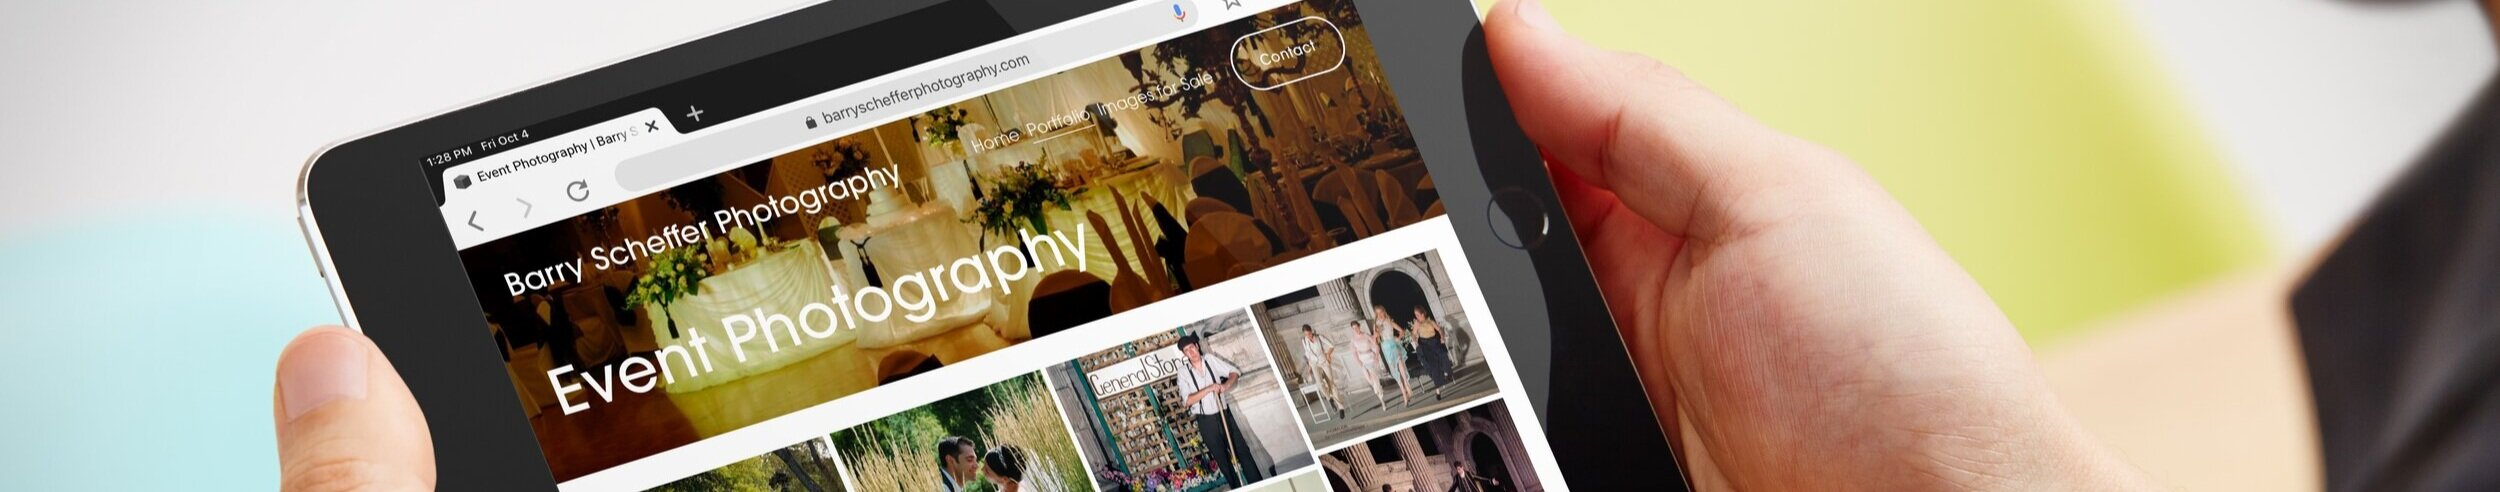 Barry Scheffer Website - Gallery Page.jpeg